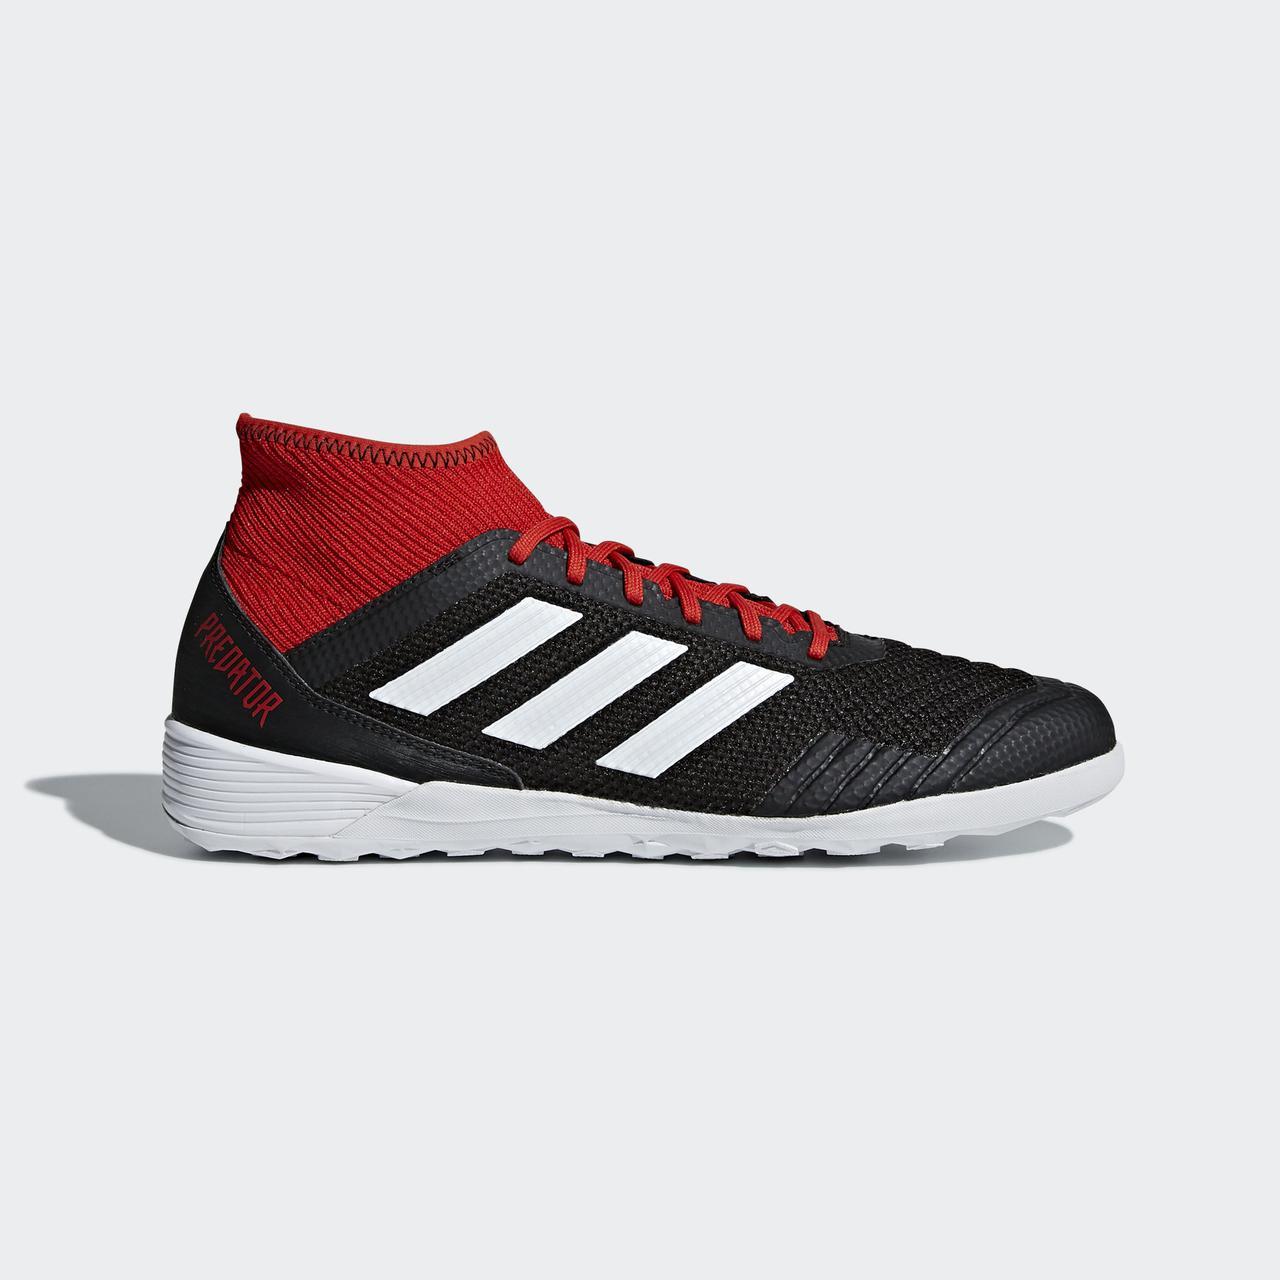 808c1473 Футбольные бутсы Adidas Performance Predator Tango 18.3 IN (Артикул: DB2128)  - Интернет-